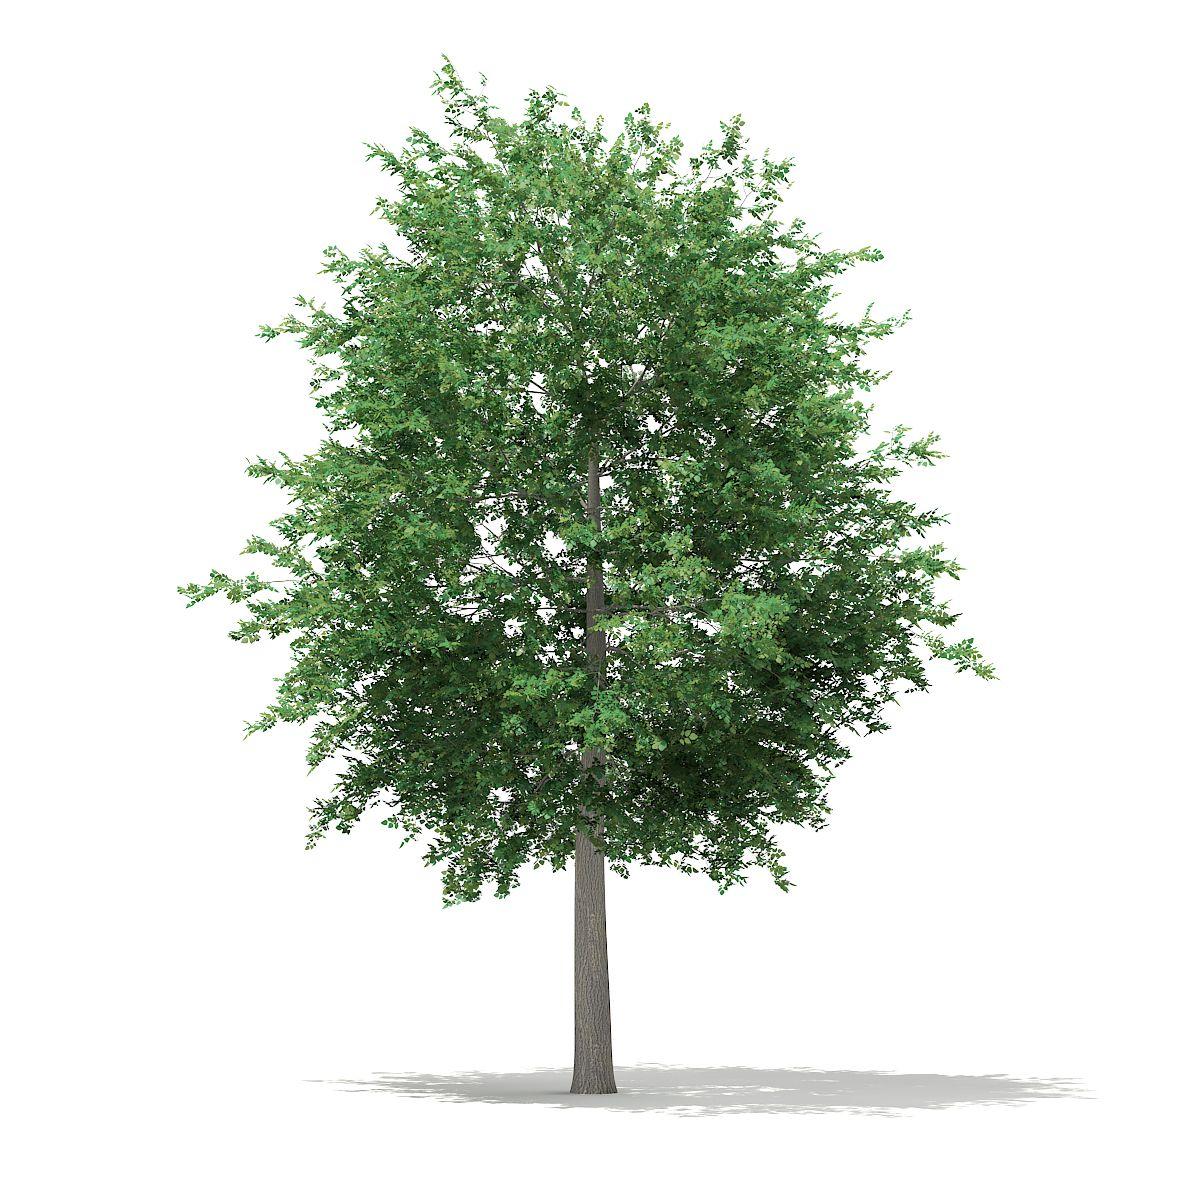 Bigtooth Aspen Populus Grandidentata 12m Tree Photoshop Landscape Sketch Aspen Trees